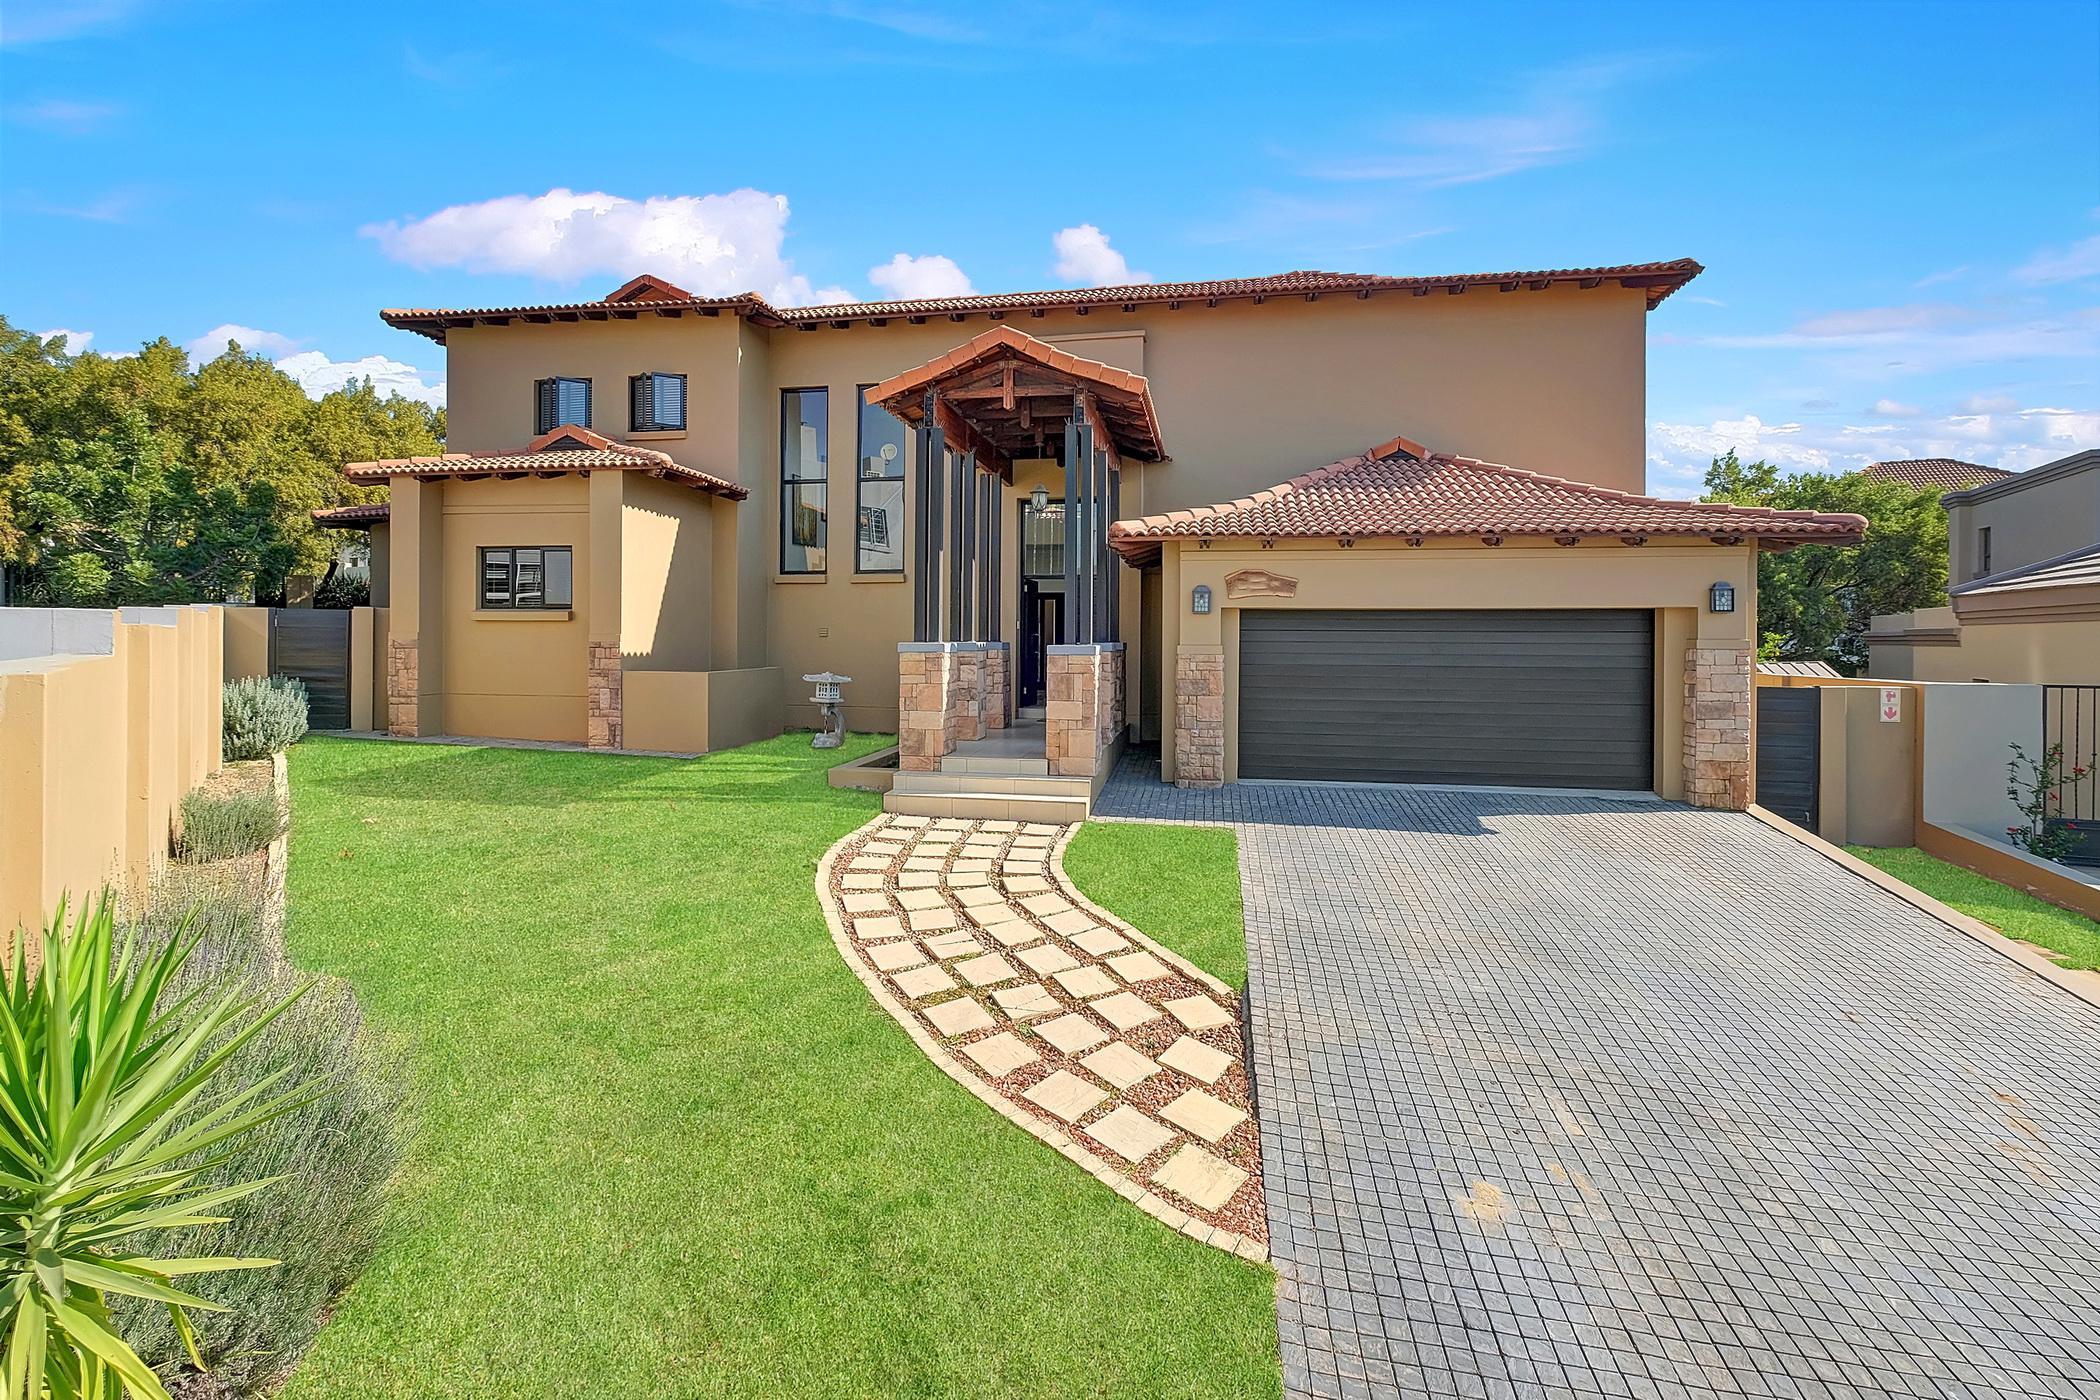 3 Bedroom Cluster Houses For Sale | Cedar Creek | Pam Golding Properties